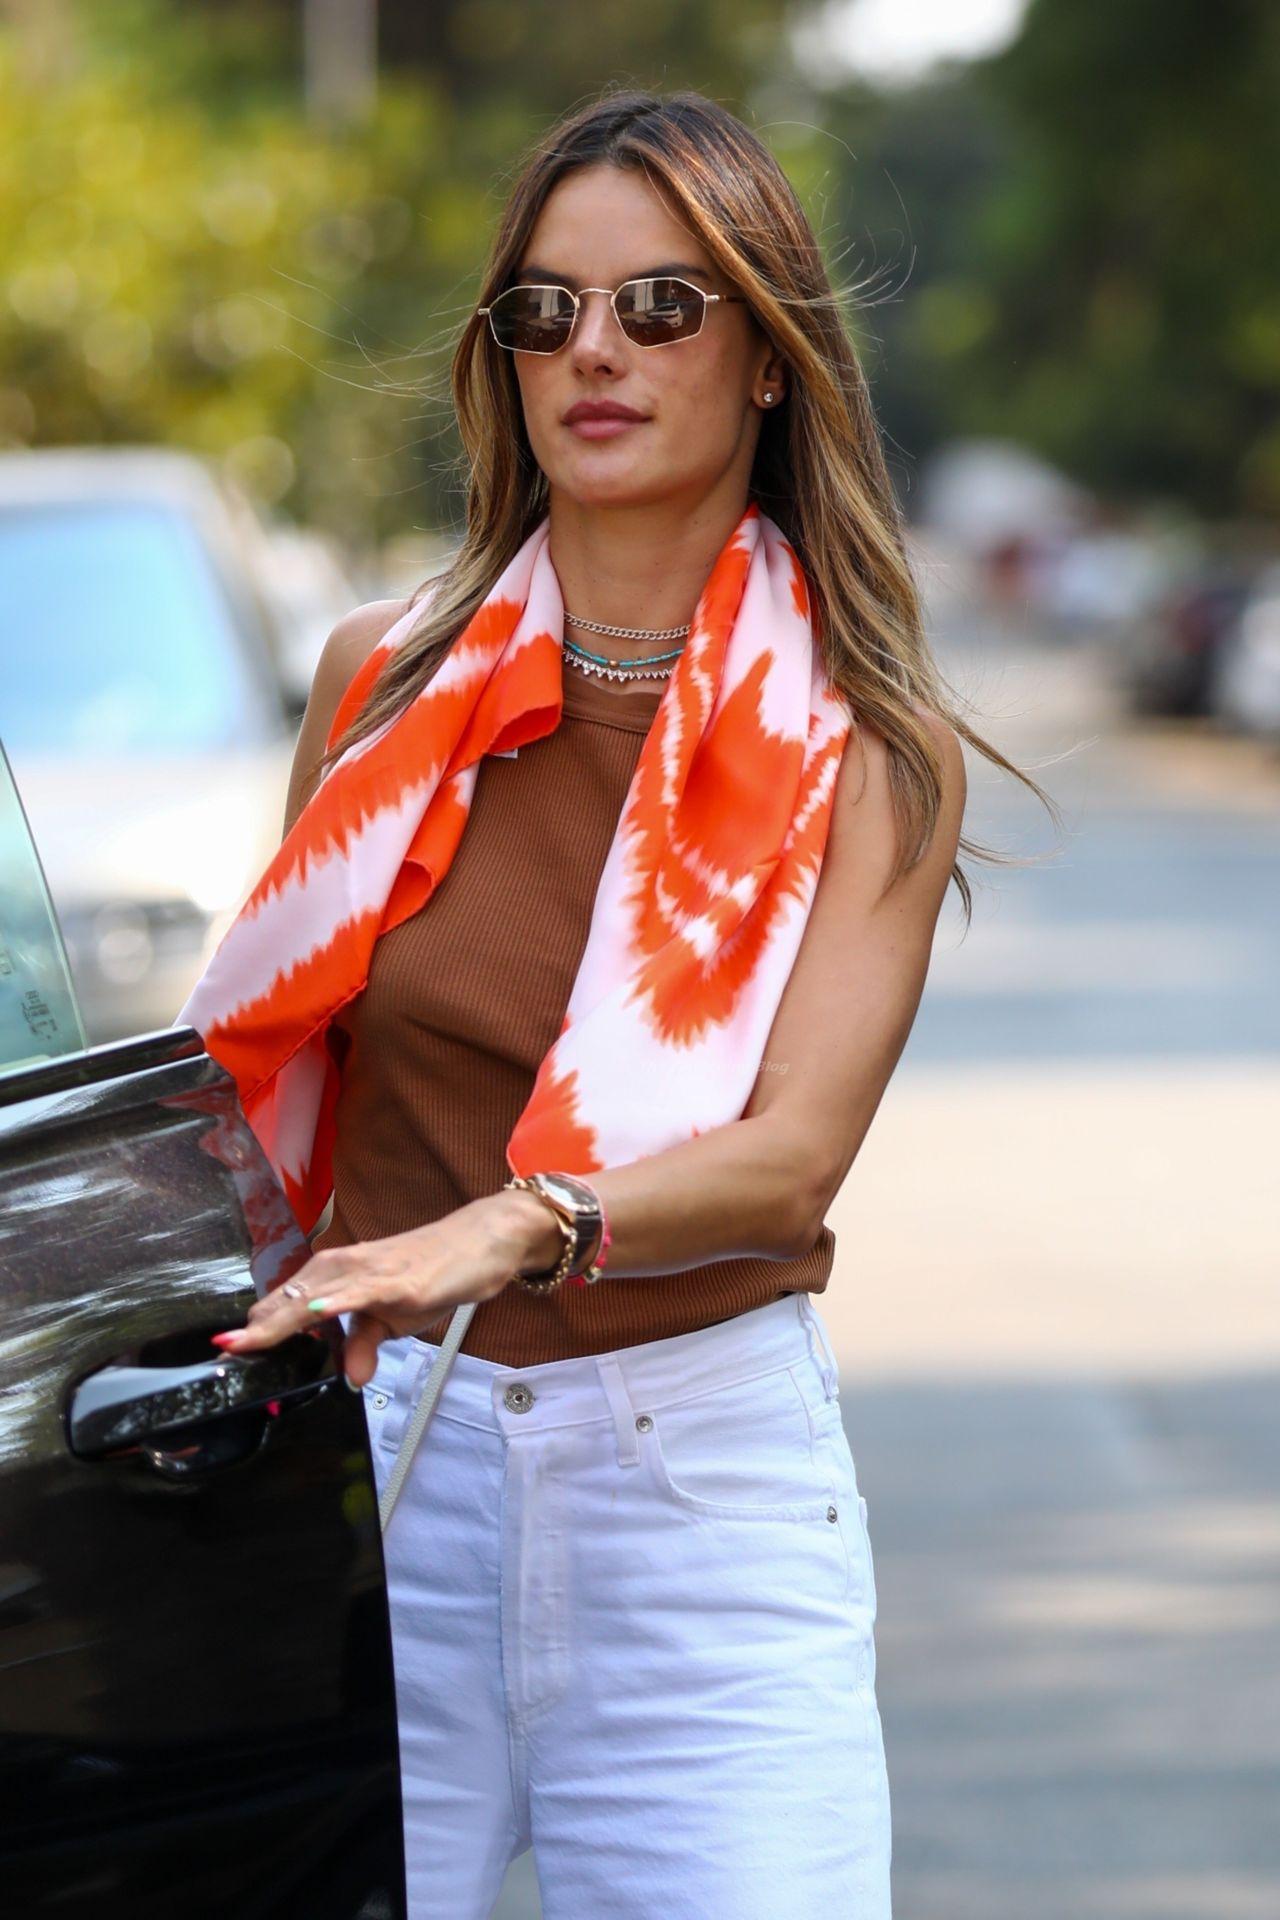 Alessandra-Ambrosio-Braless-The-Fappening-Blog-40.jpg